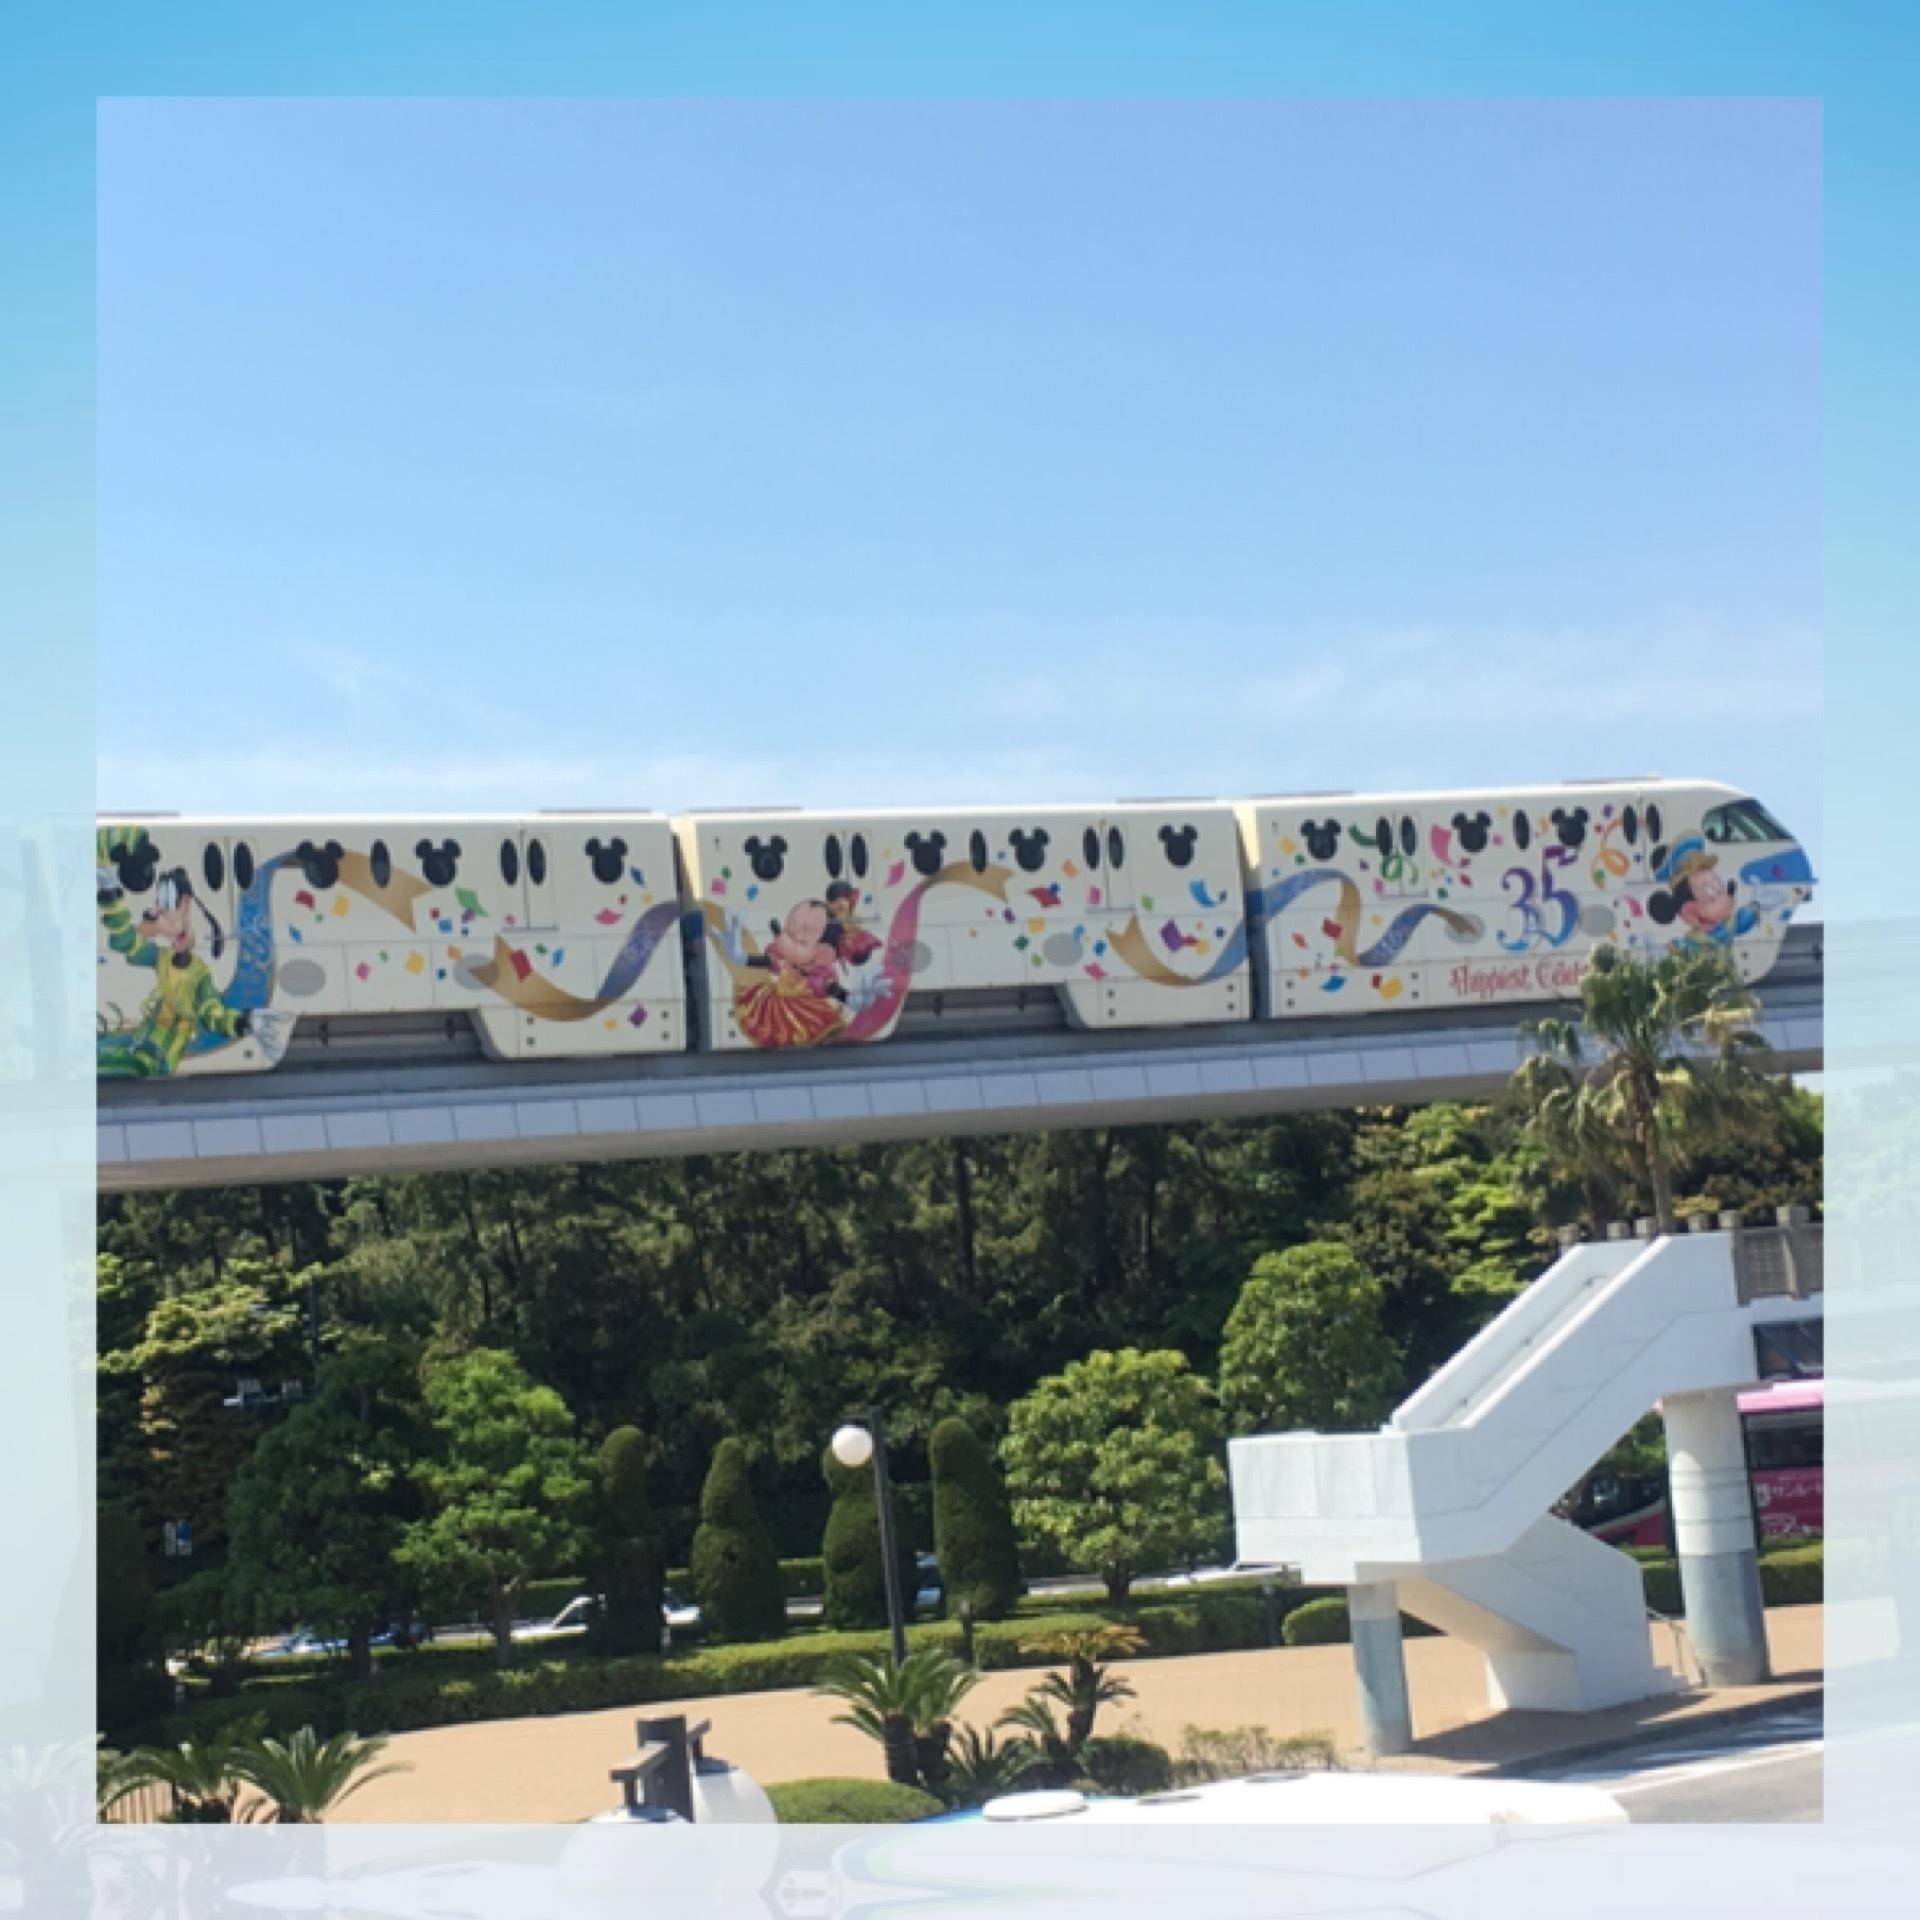 Tokyo Disneyland《 35 Happiest Gelebration! 》に行ってきました♫_1_2-3